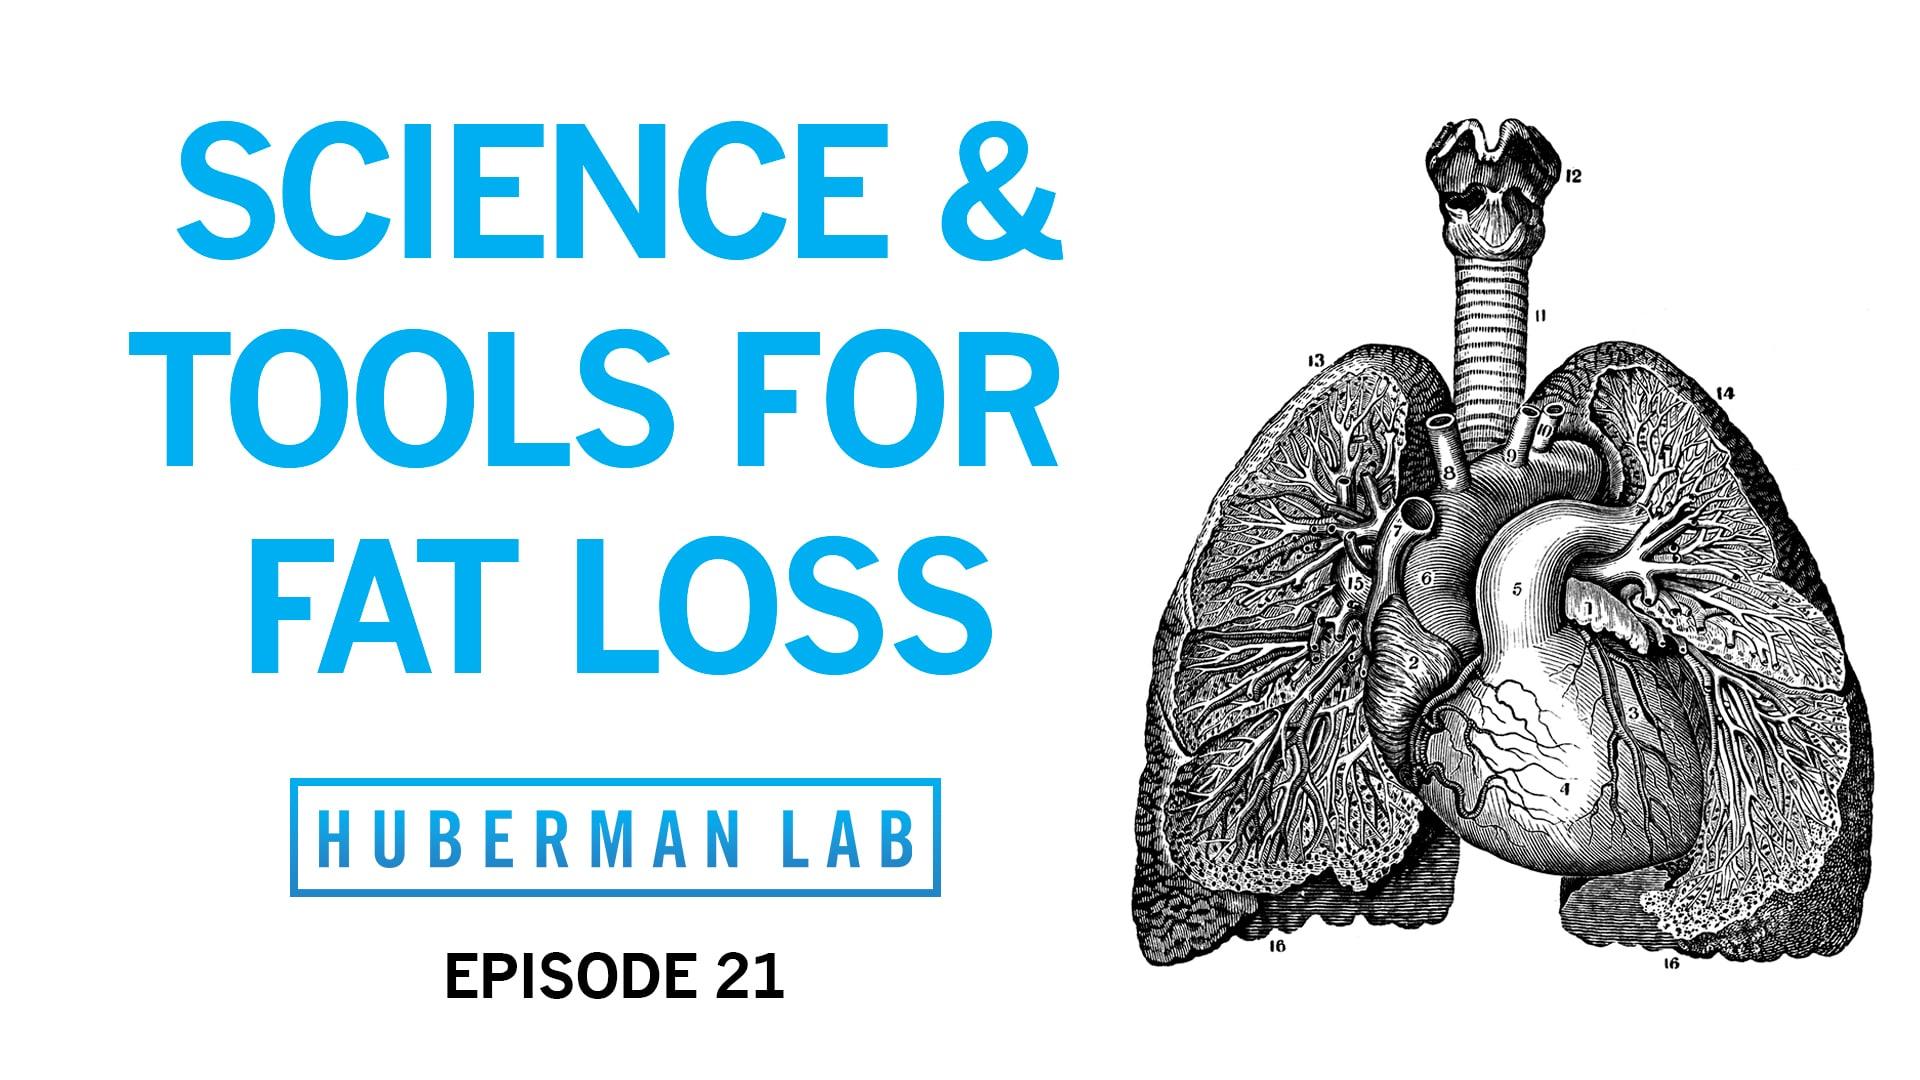 Huberman Lab Podcast Episode 21 Title Card